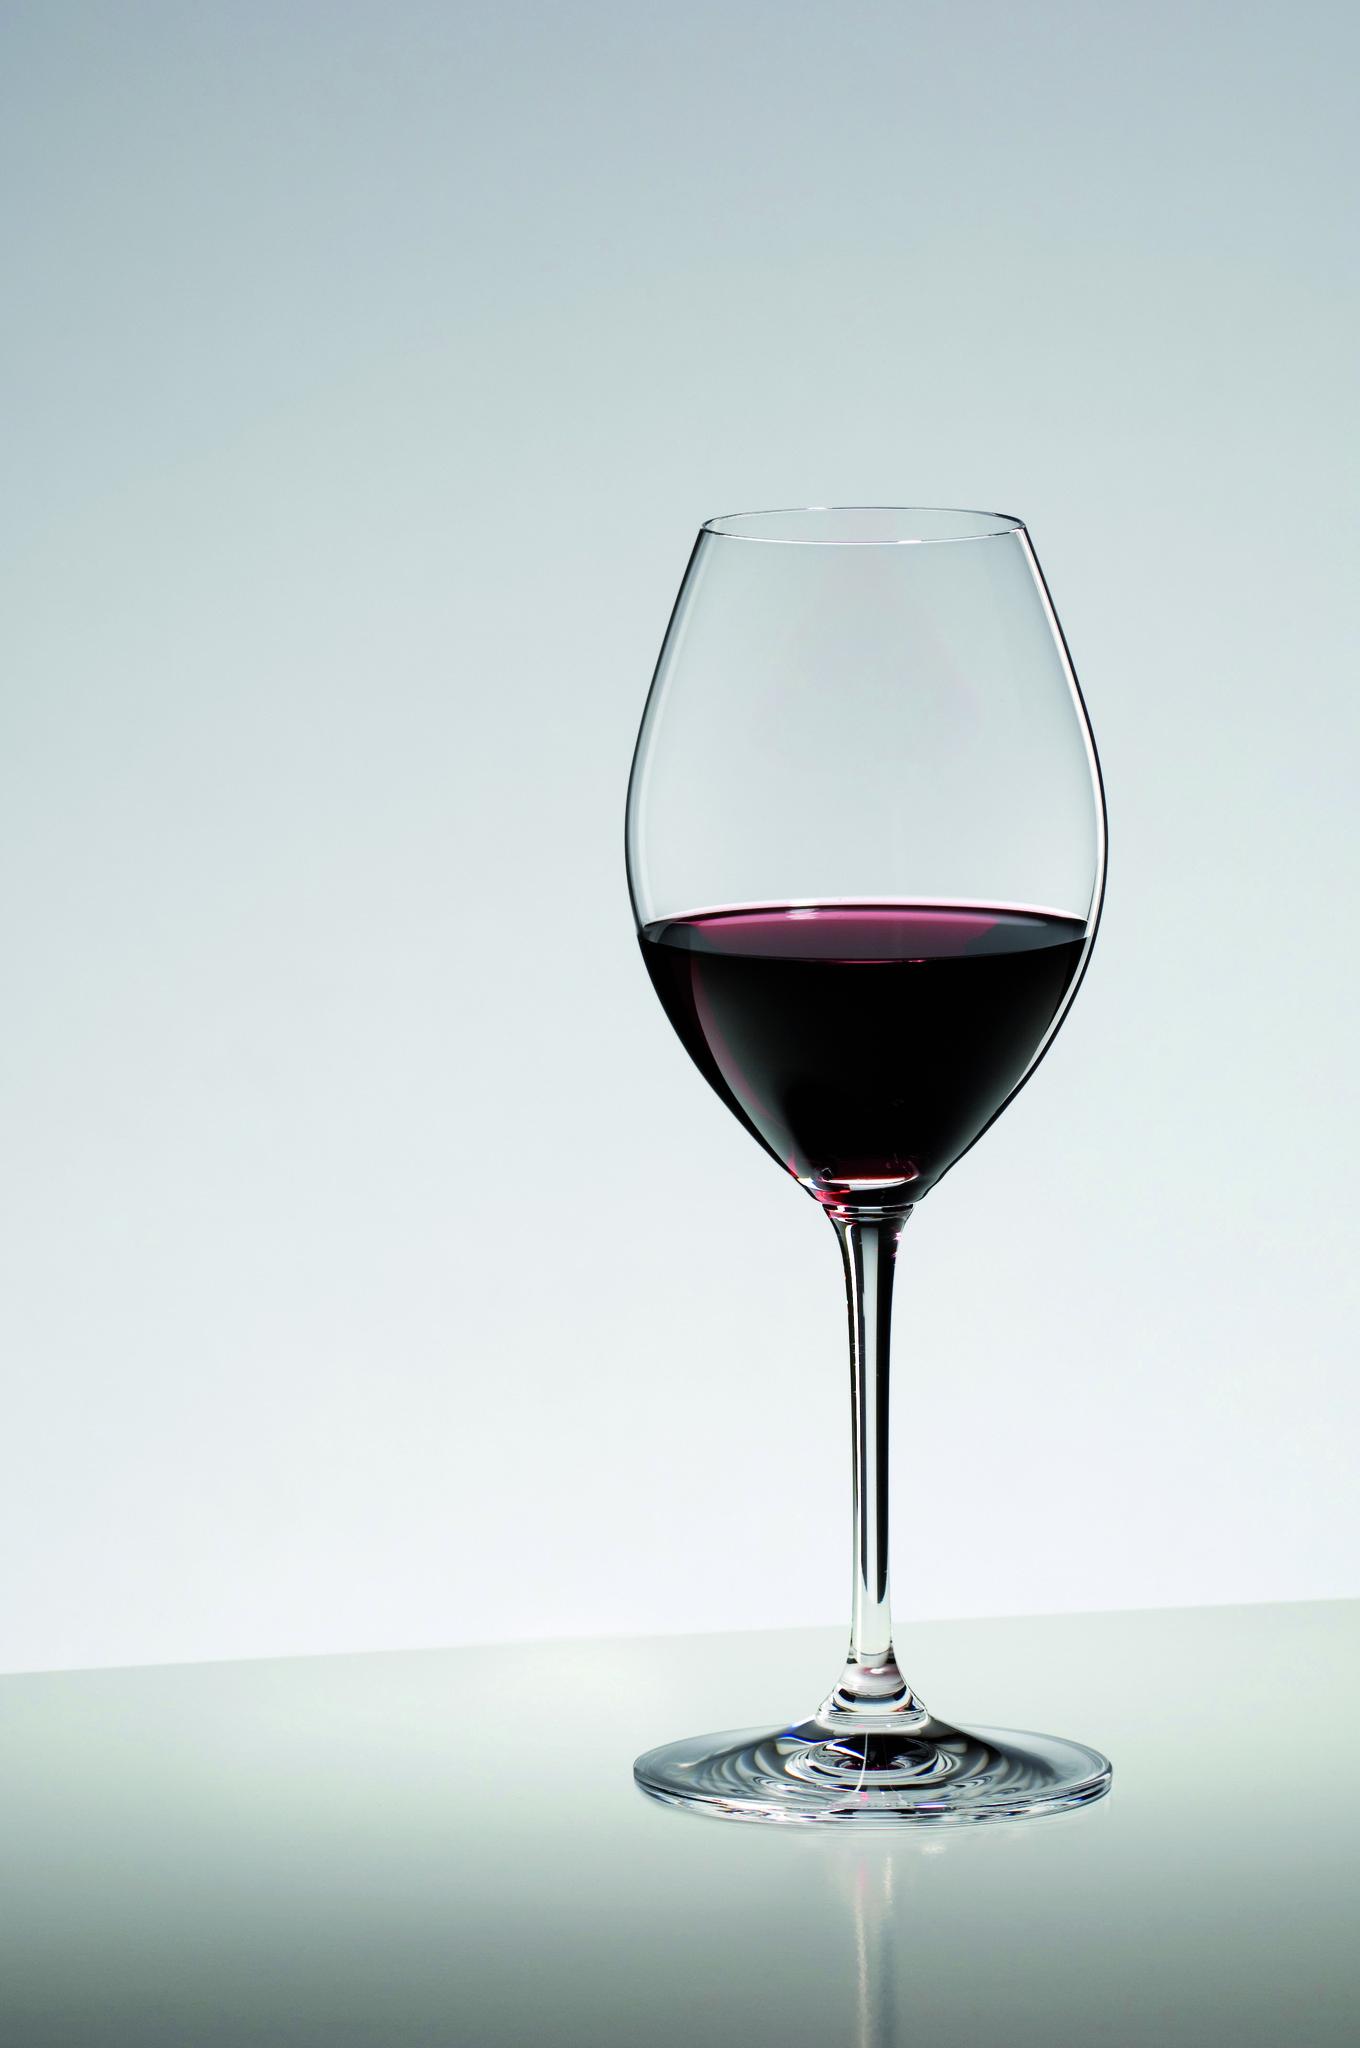 Бокалы Набор бокалов для красного вина 2шт 400мл Riedel Vinum Tempranillo nabor-bokalov-dlya-krasnogo-vina-2-sht-400-ml-riedel-vinum-tempranillo-avstriya.jpg